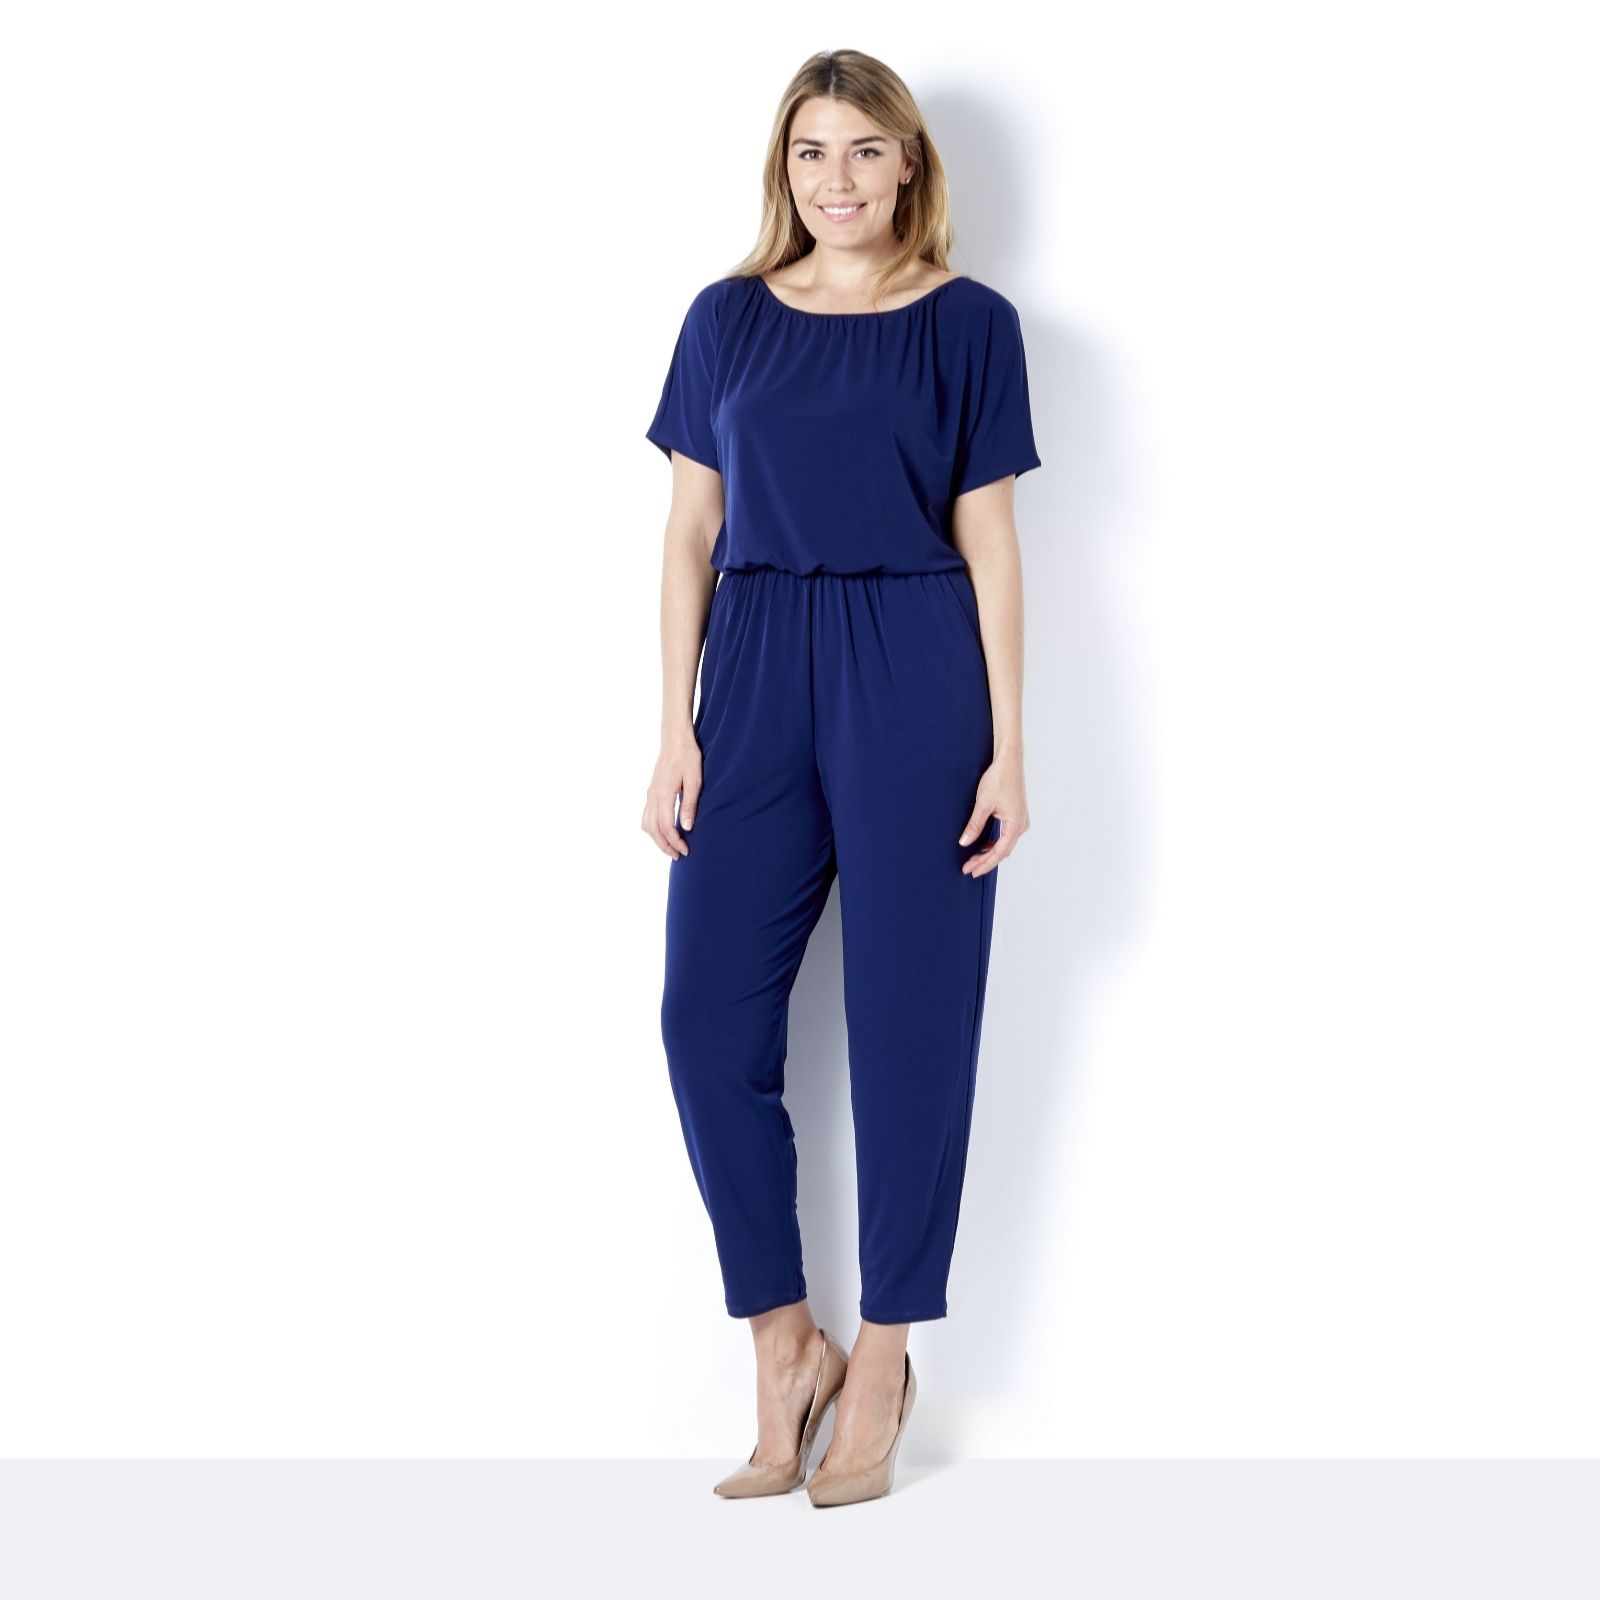 d8c54977121 Kim   Co Brazil Jersey Dolman Sleeve Jumpsuit Petite - QVC UK